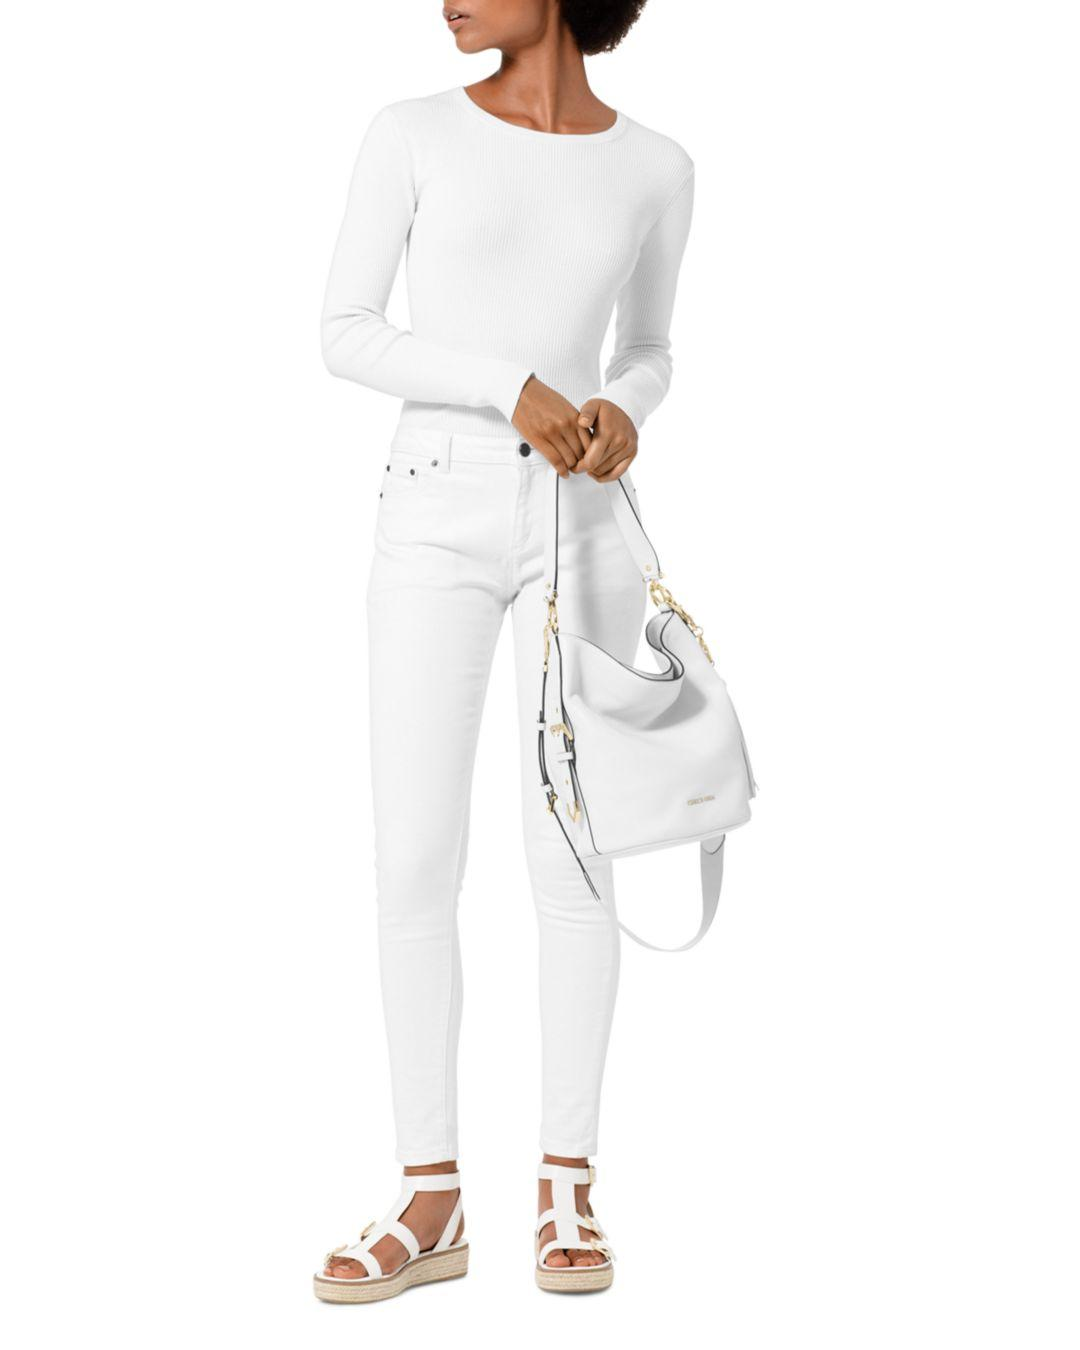 d3d72a9a1c0d MICHAEL Michael Kors Brooke Medium Pebbled Leather Bucket Bag in White -  Lyst